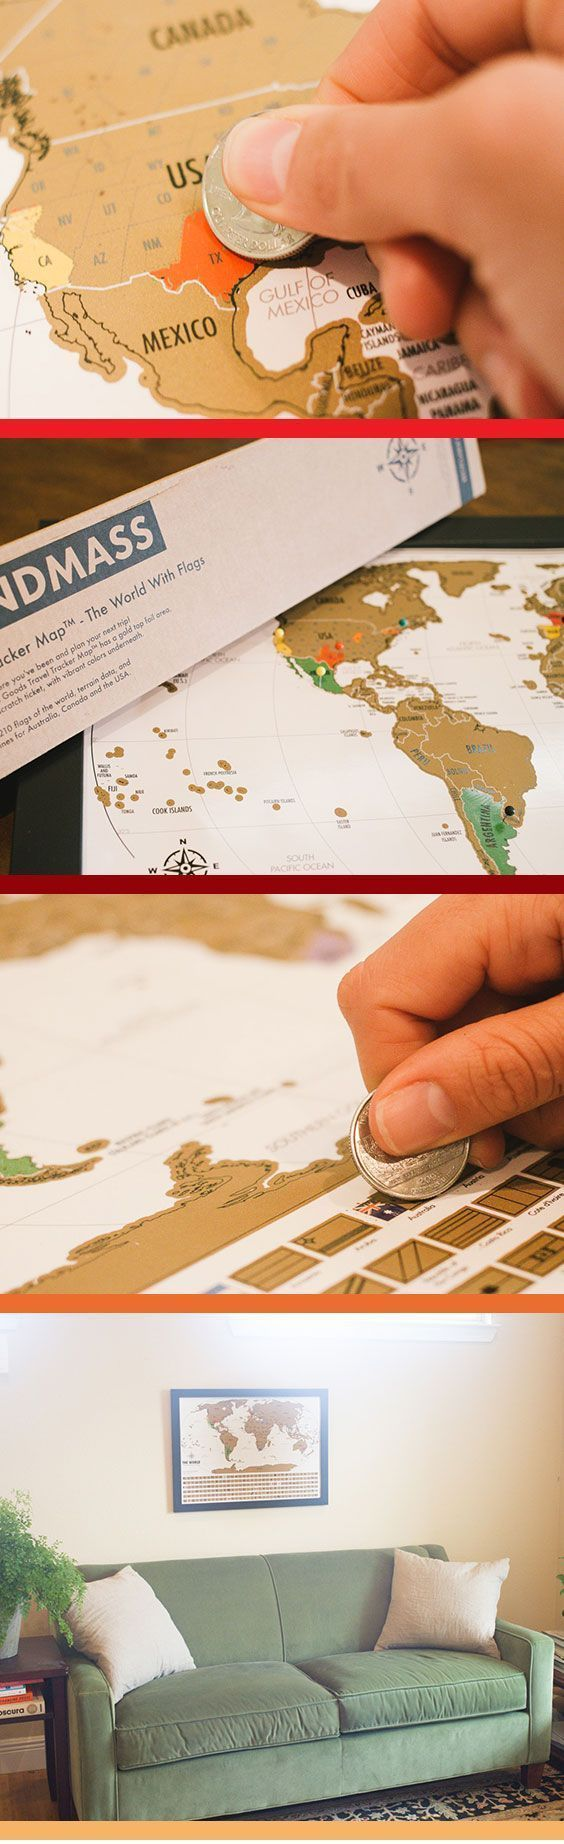 Free USA shipping Landmassu0027s World Travel Tracker